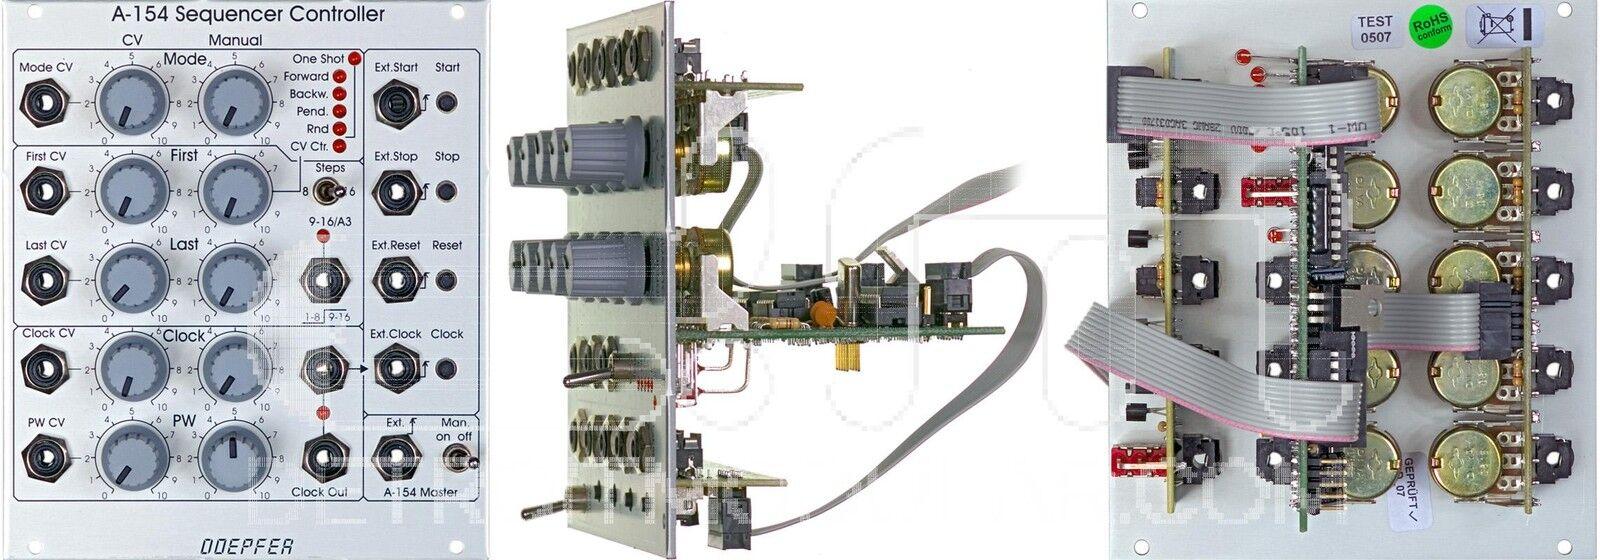 Doepfer A-154 Sequencer Controller   Eurorack Module   NEW